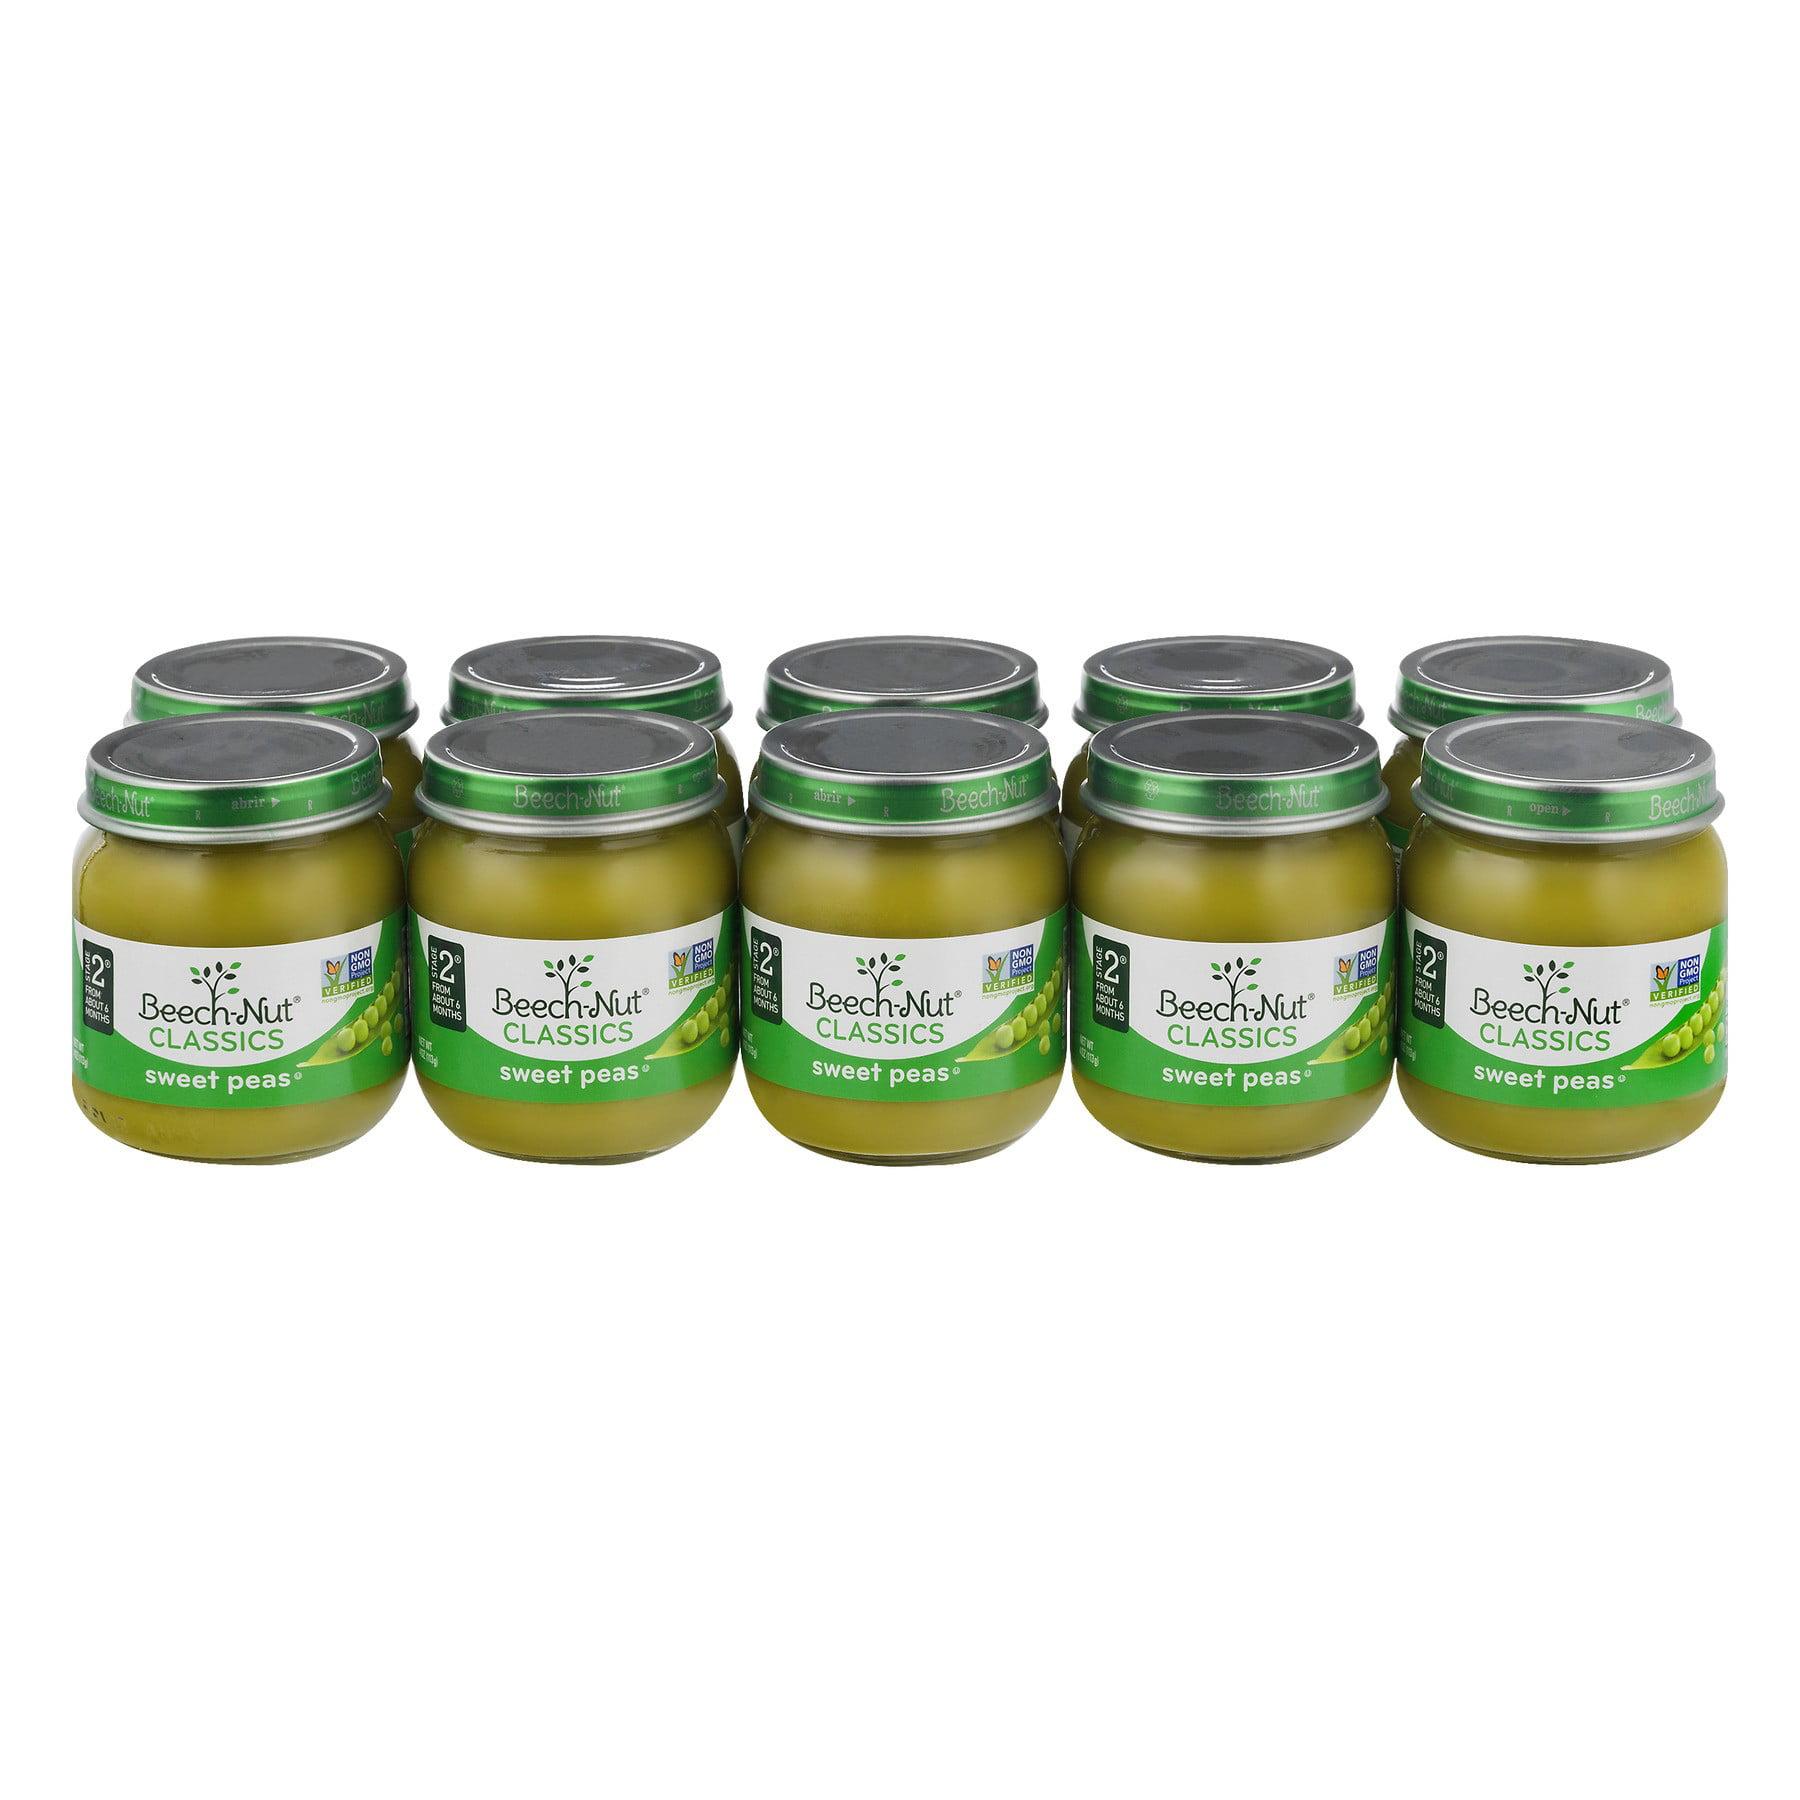 Beech-Nut Classics Sweet Peas Stage 2 - 10 PK, 10.0 PACK